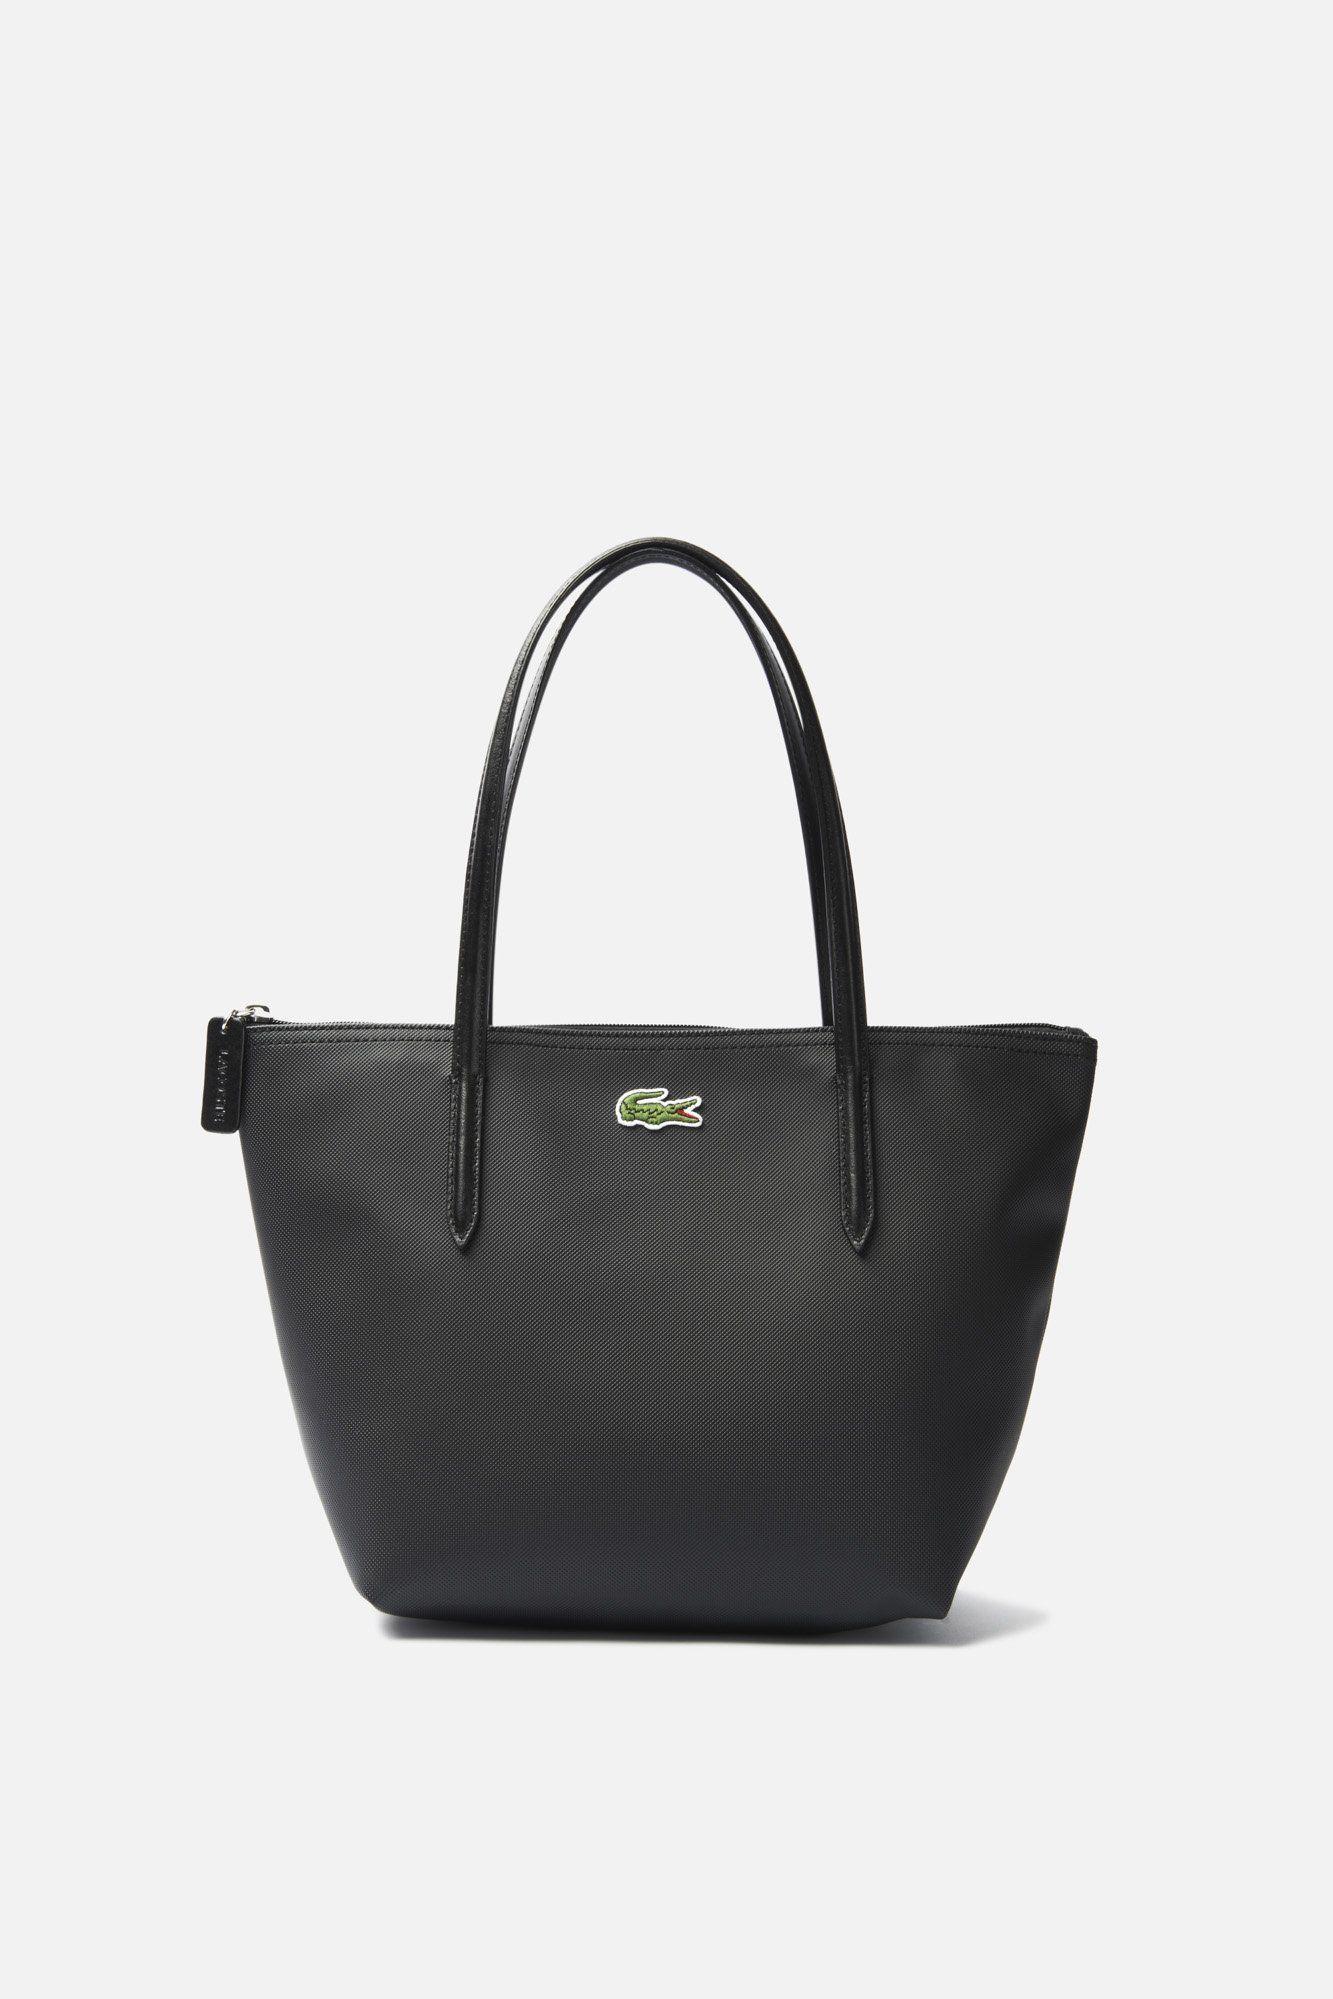 1a535b8c70d5 Lacoste Medium Small  Shopping Bag